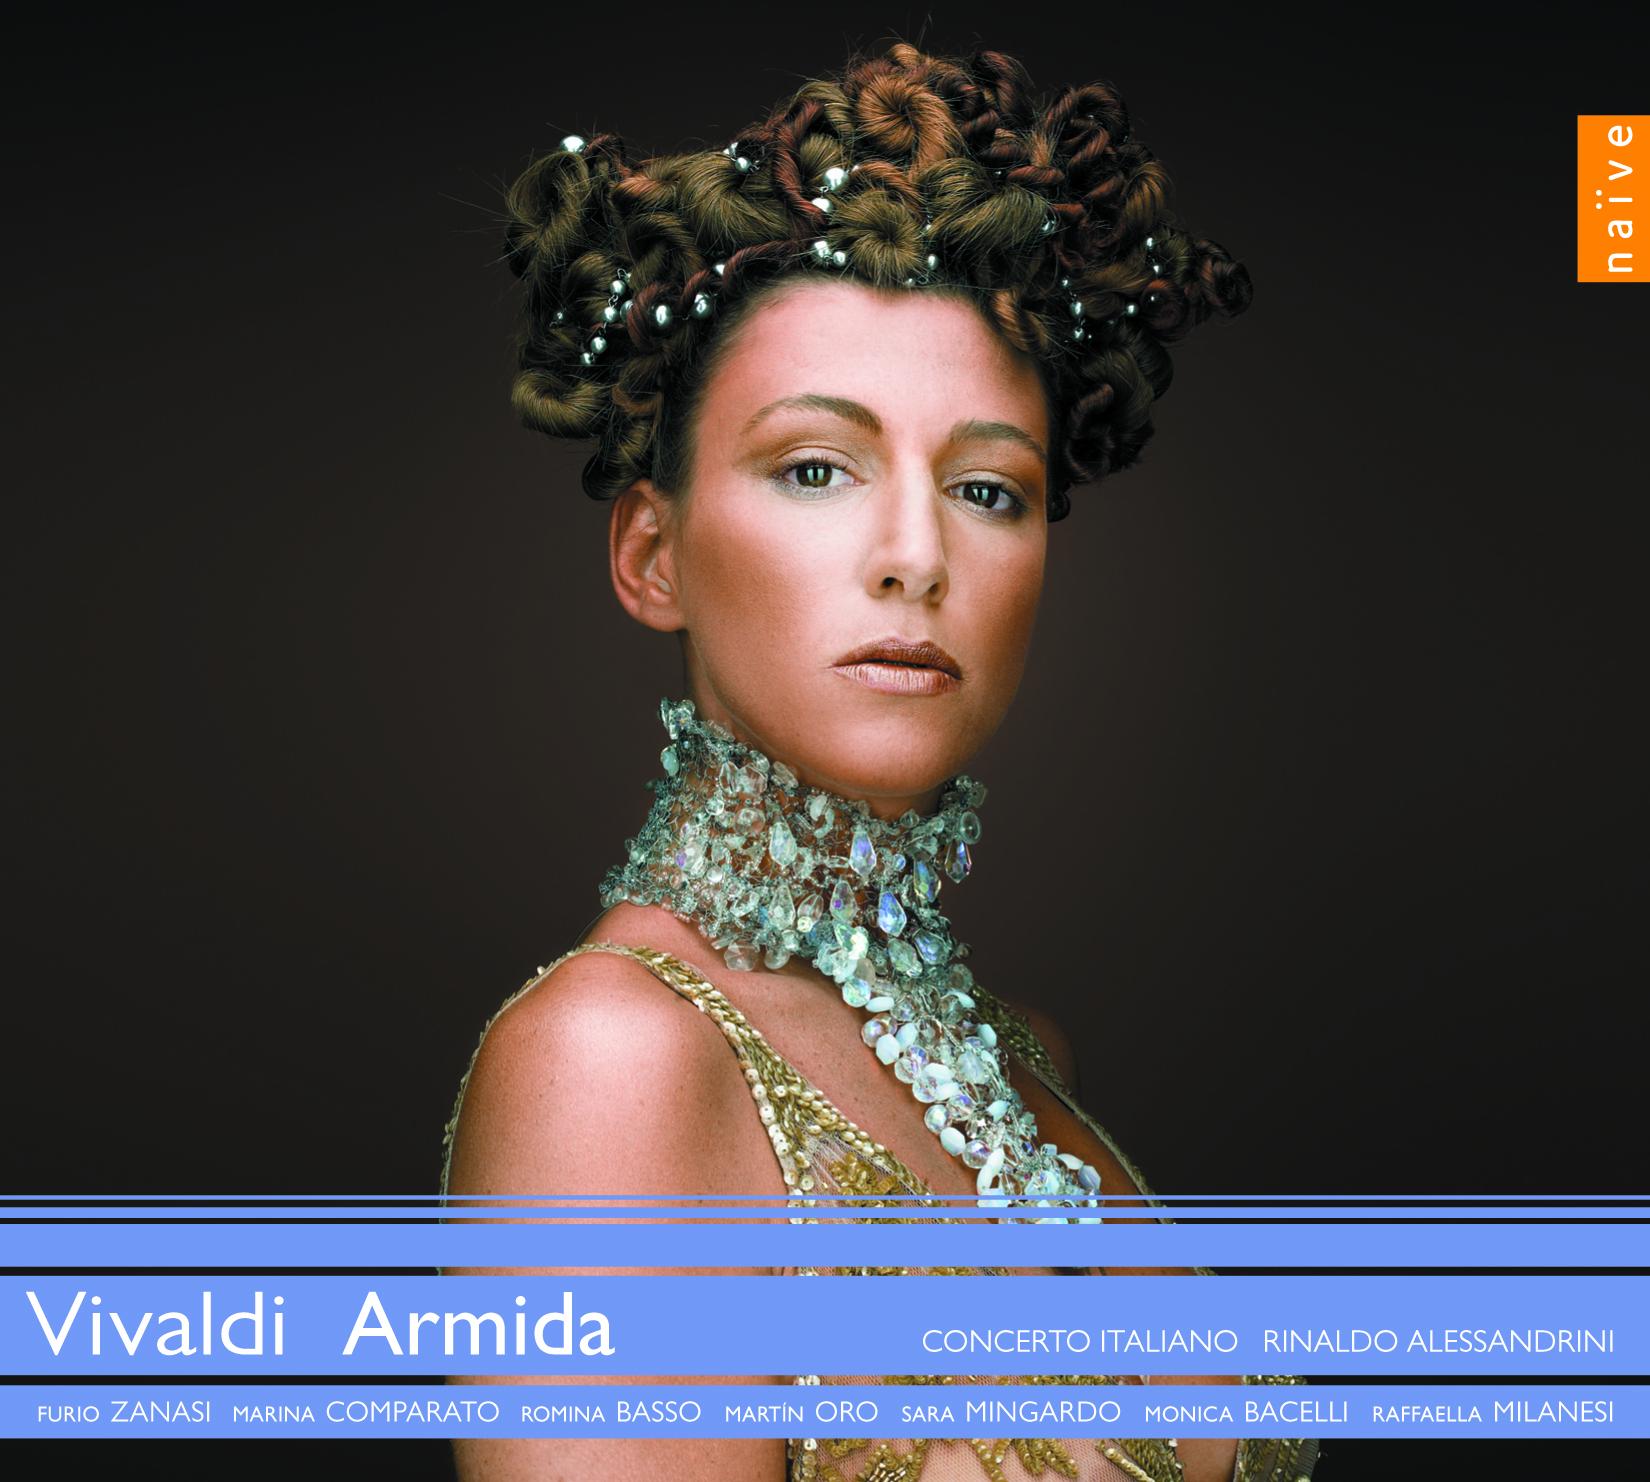 OP30492 Vivaldi Armida.jpg